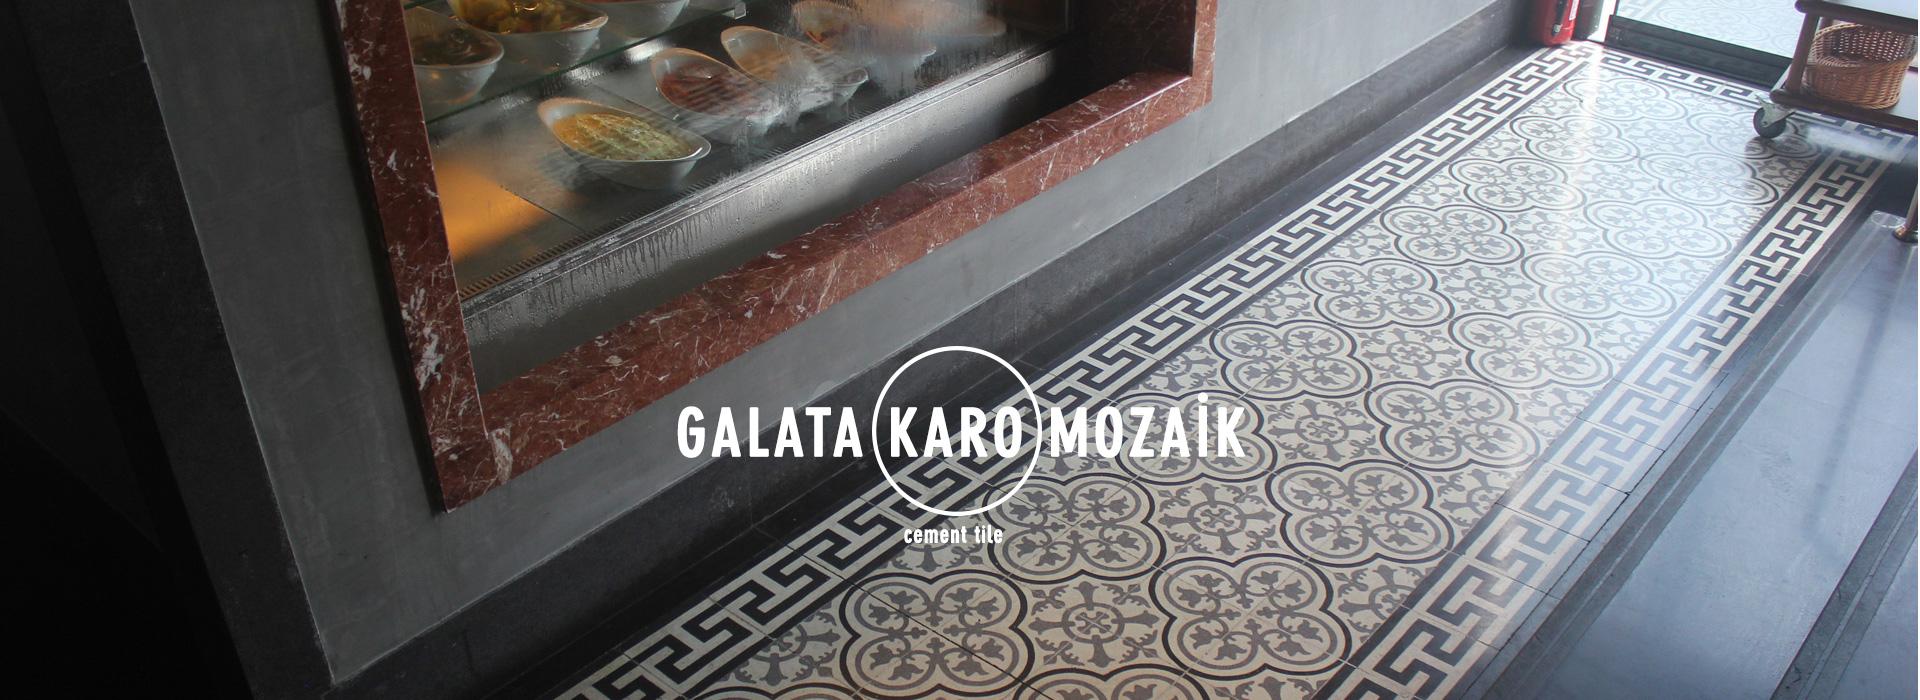 Galata Karo Mozaik - Desenli Karo Çini